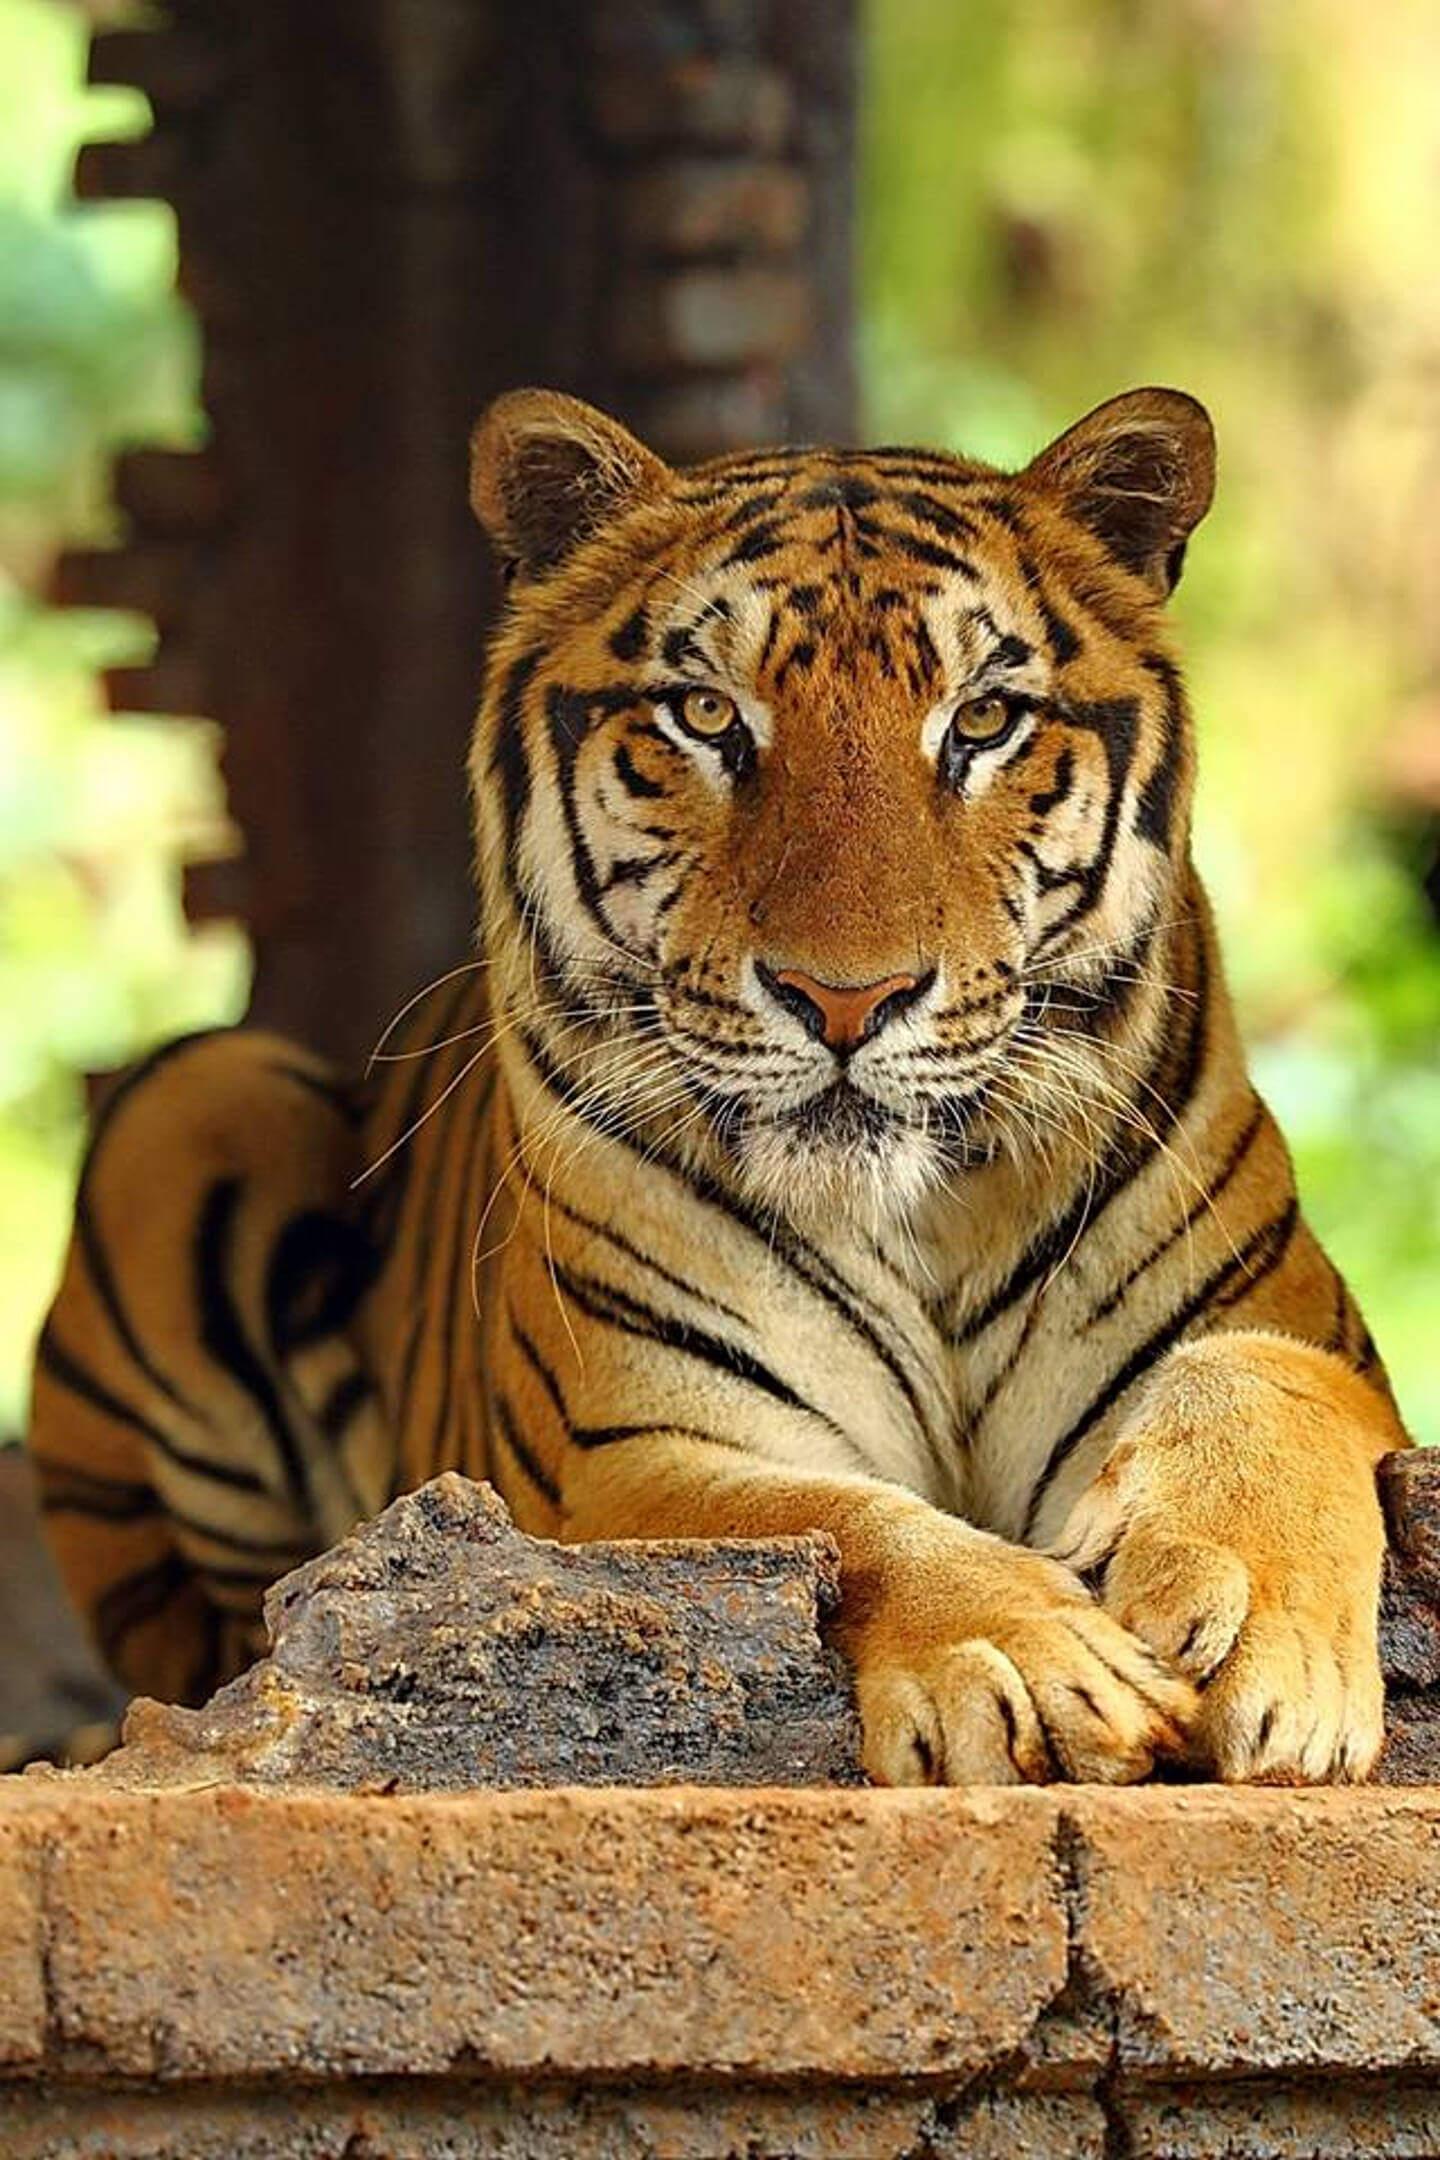 Bali Safari Park | Book direct and save 10%